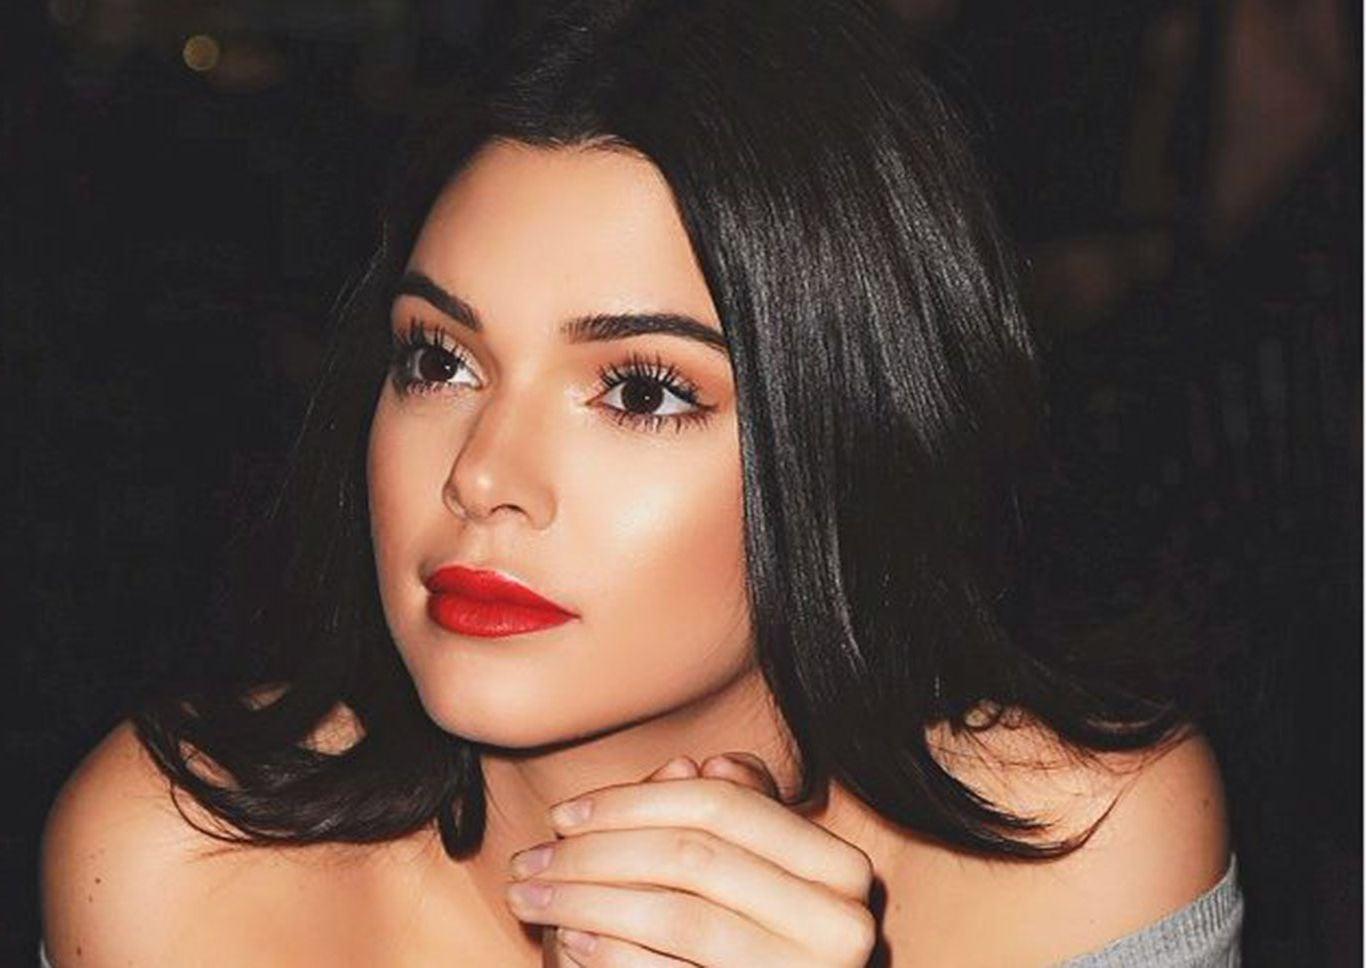 Download Kendall Jenner Iphone Wallpaper 30   Wallpaper 1366x968